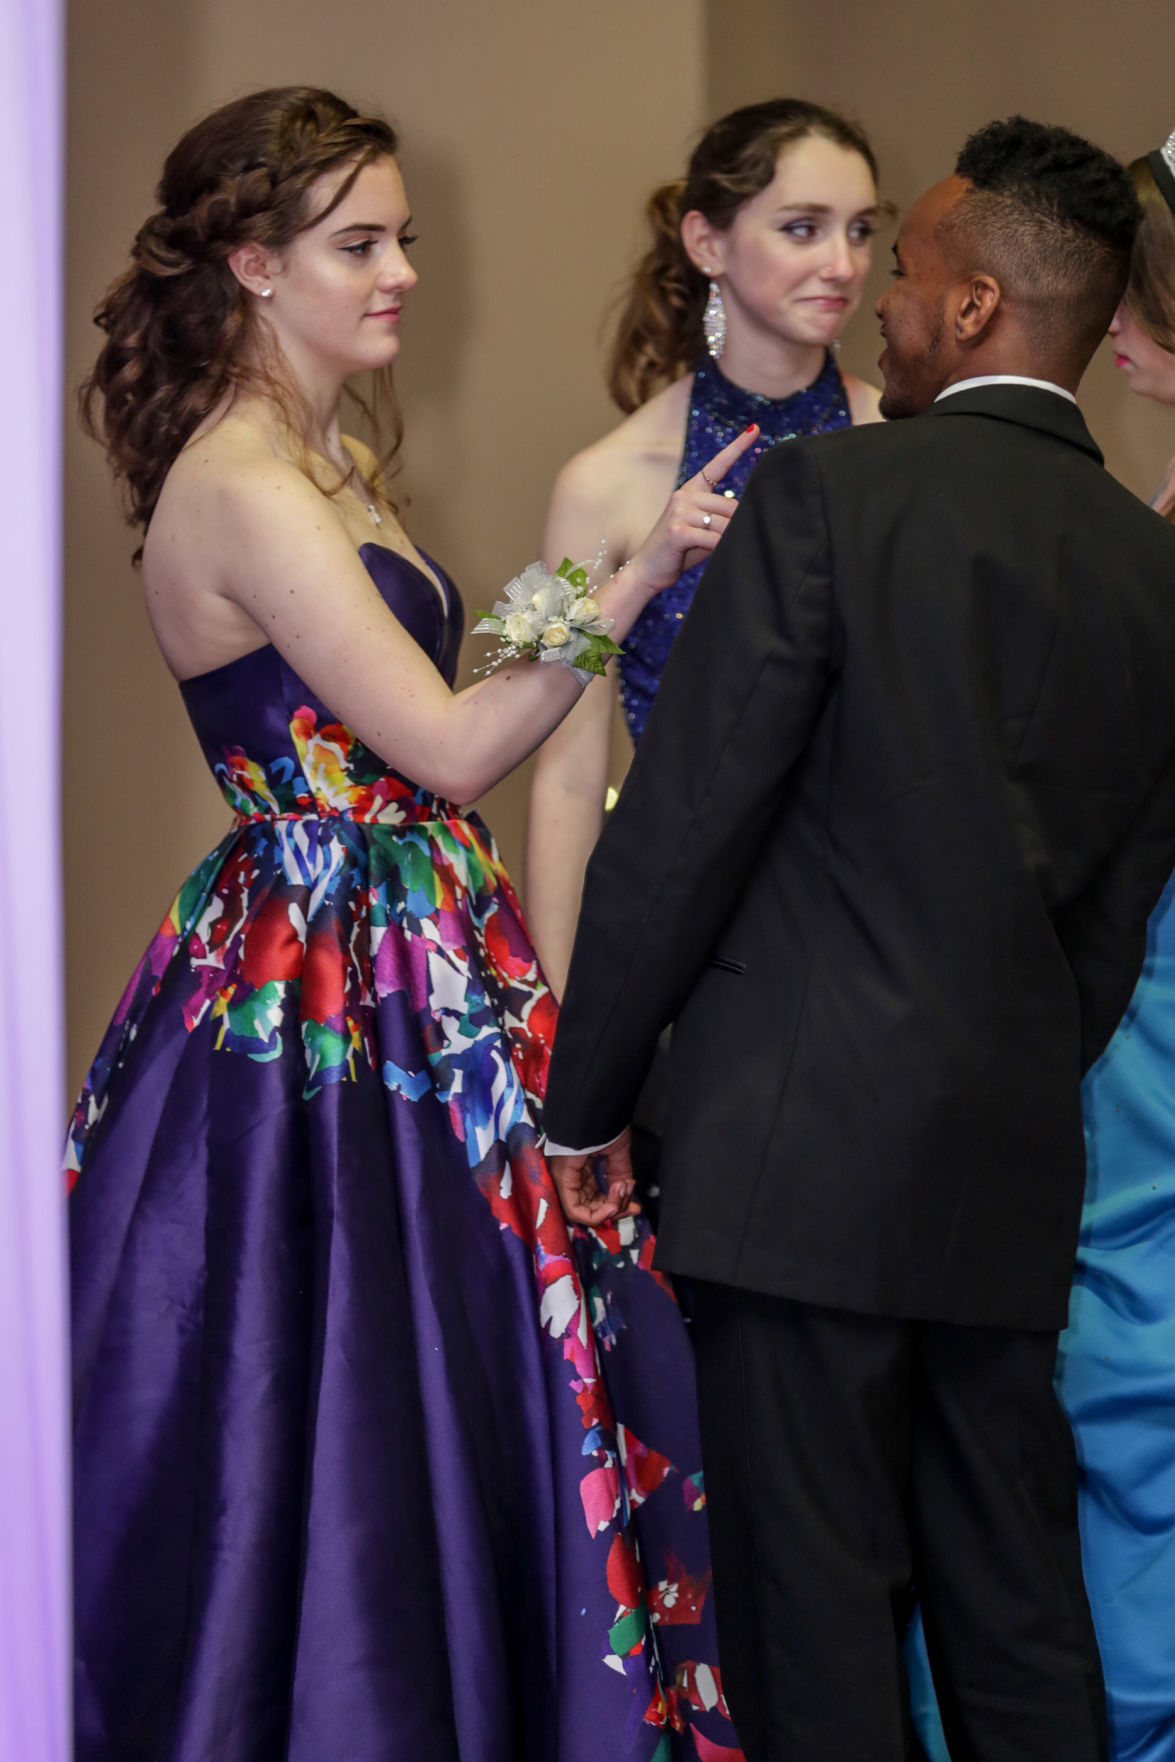 Photo Gallery Glenpool High School prom